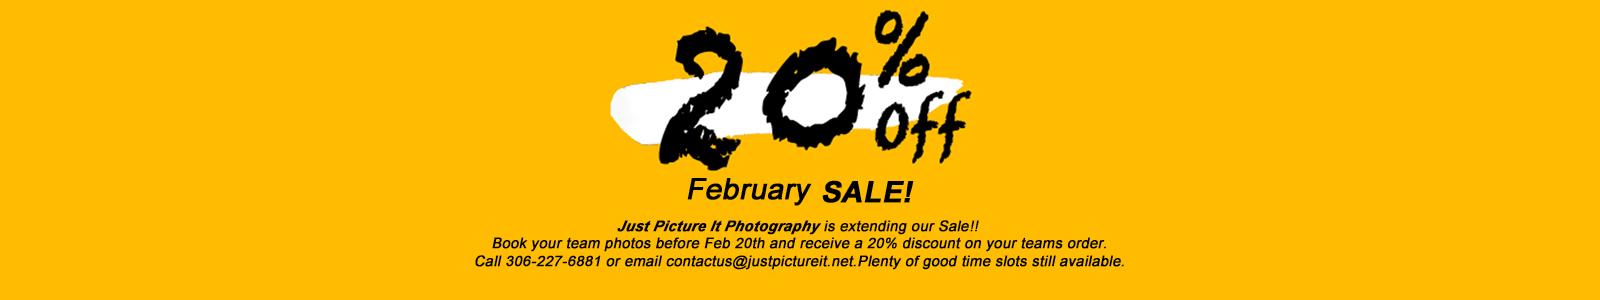 February Sale!